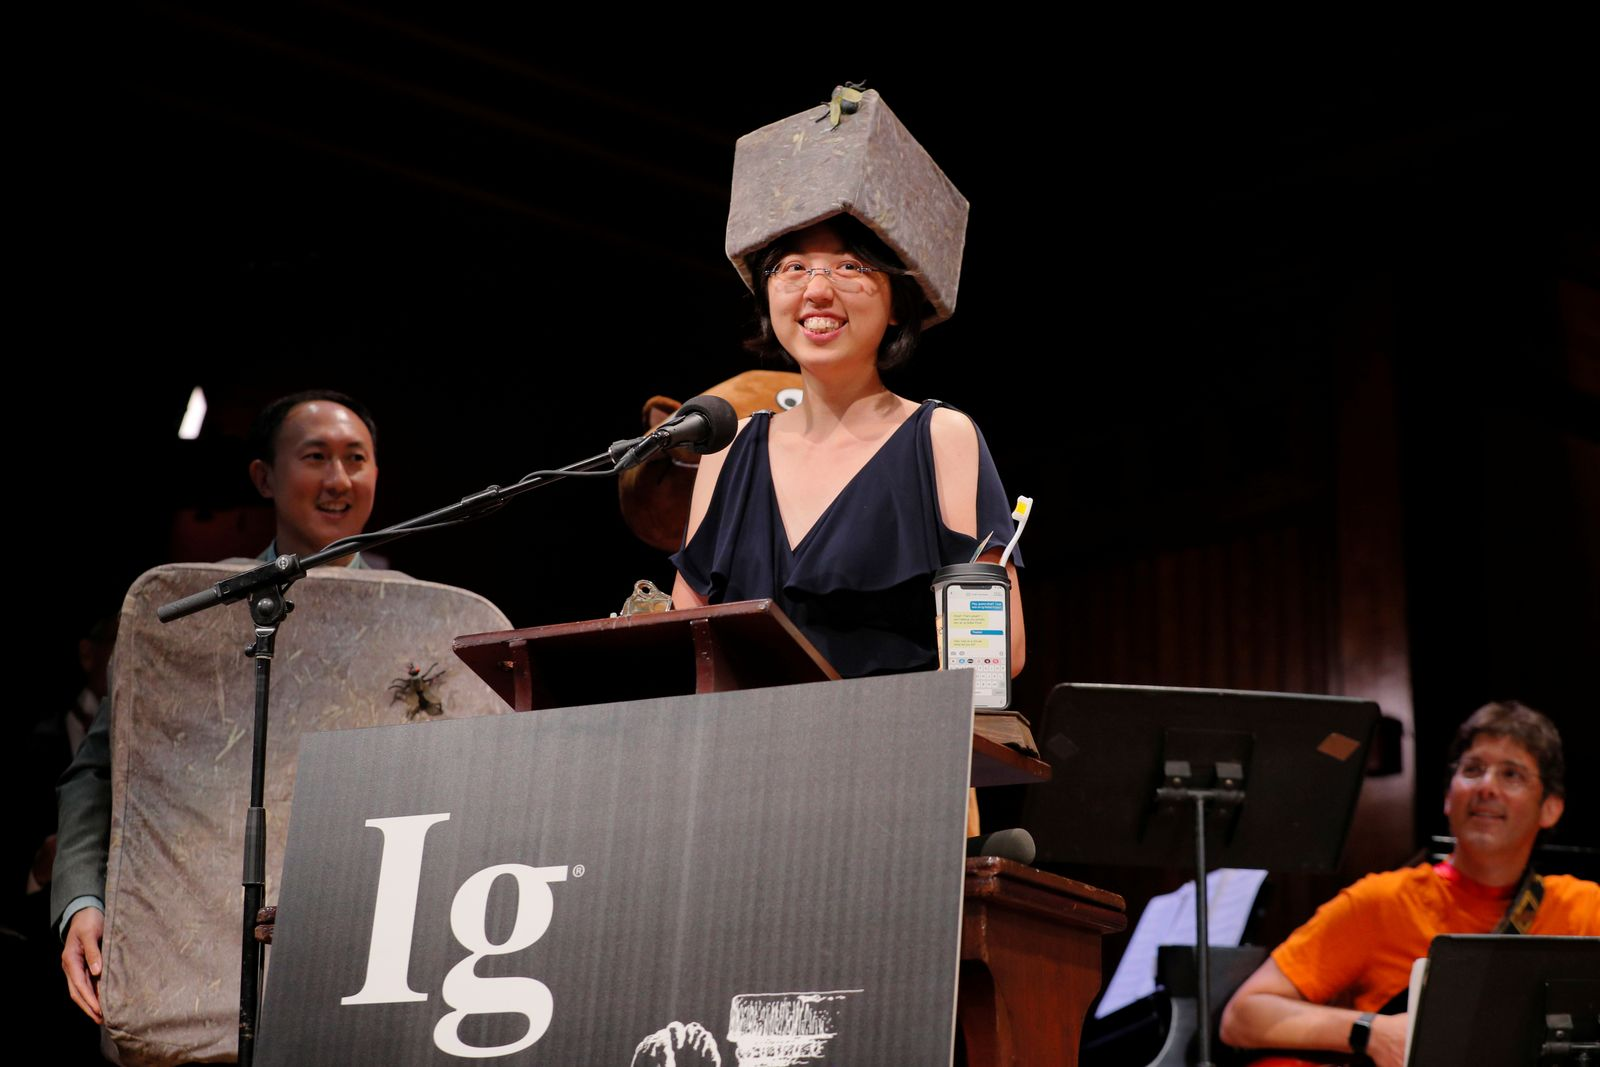 IG Nobelpreis Physik/ Patricia Yang